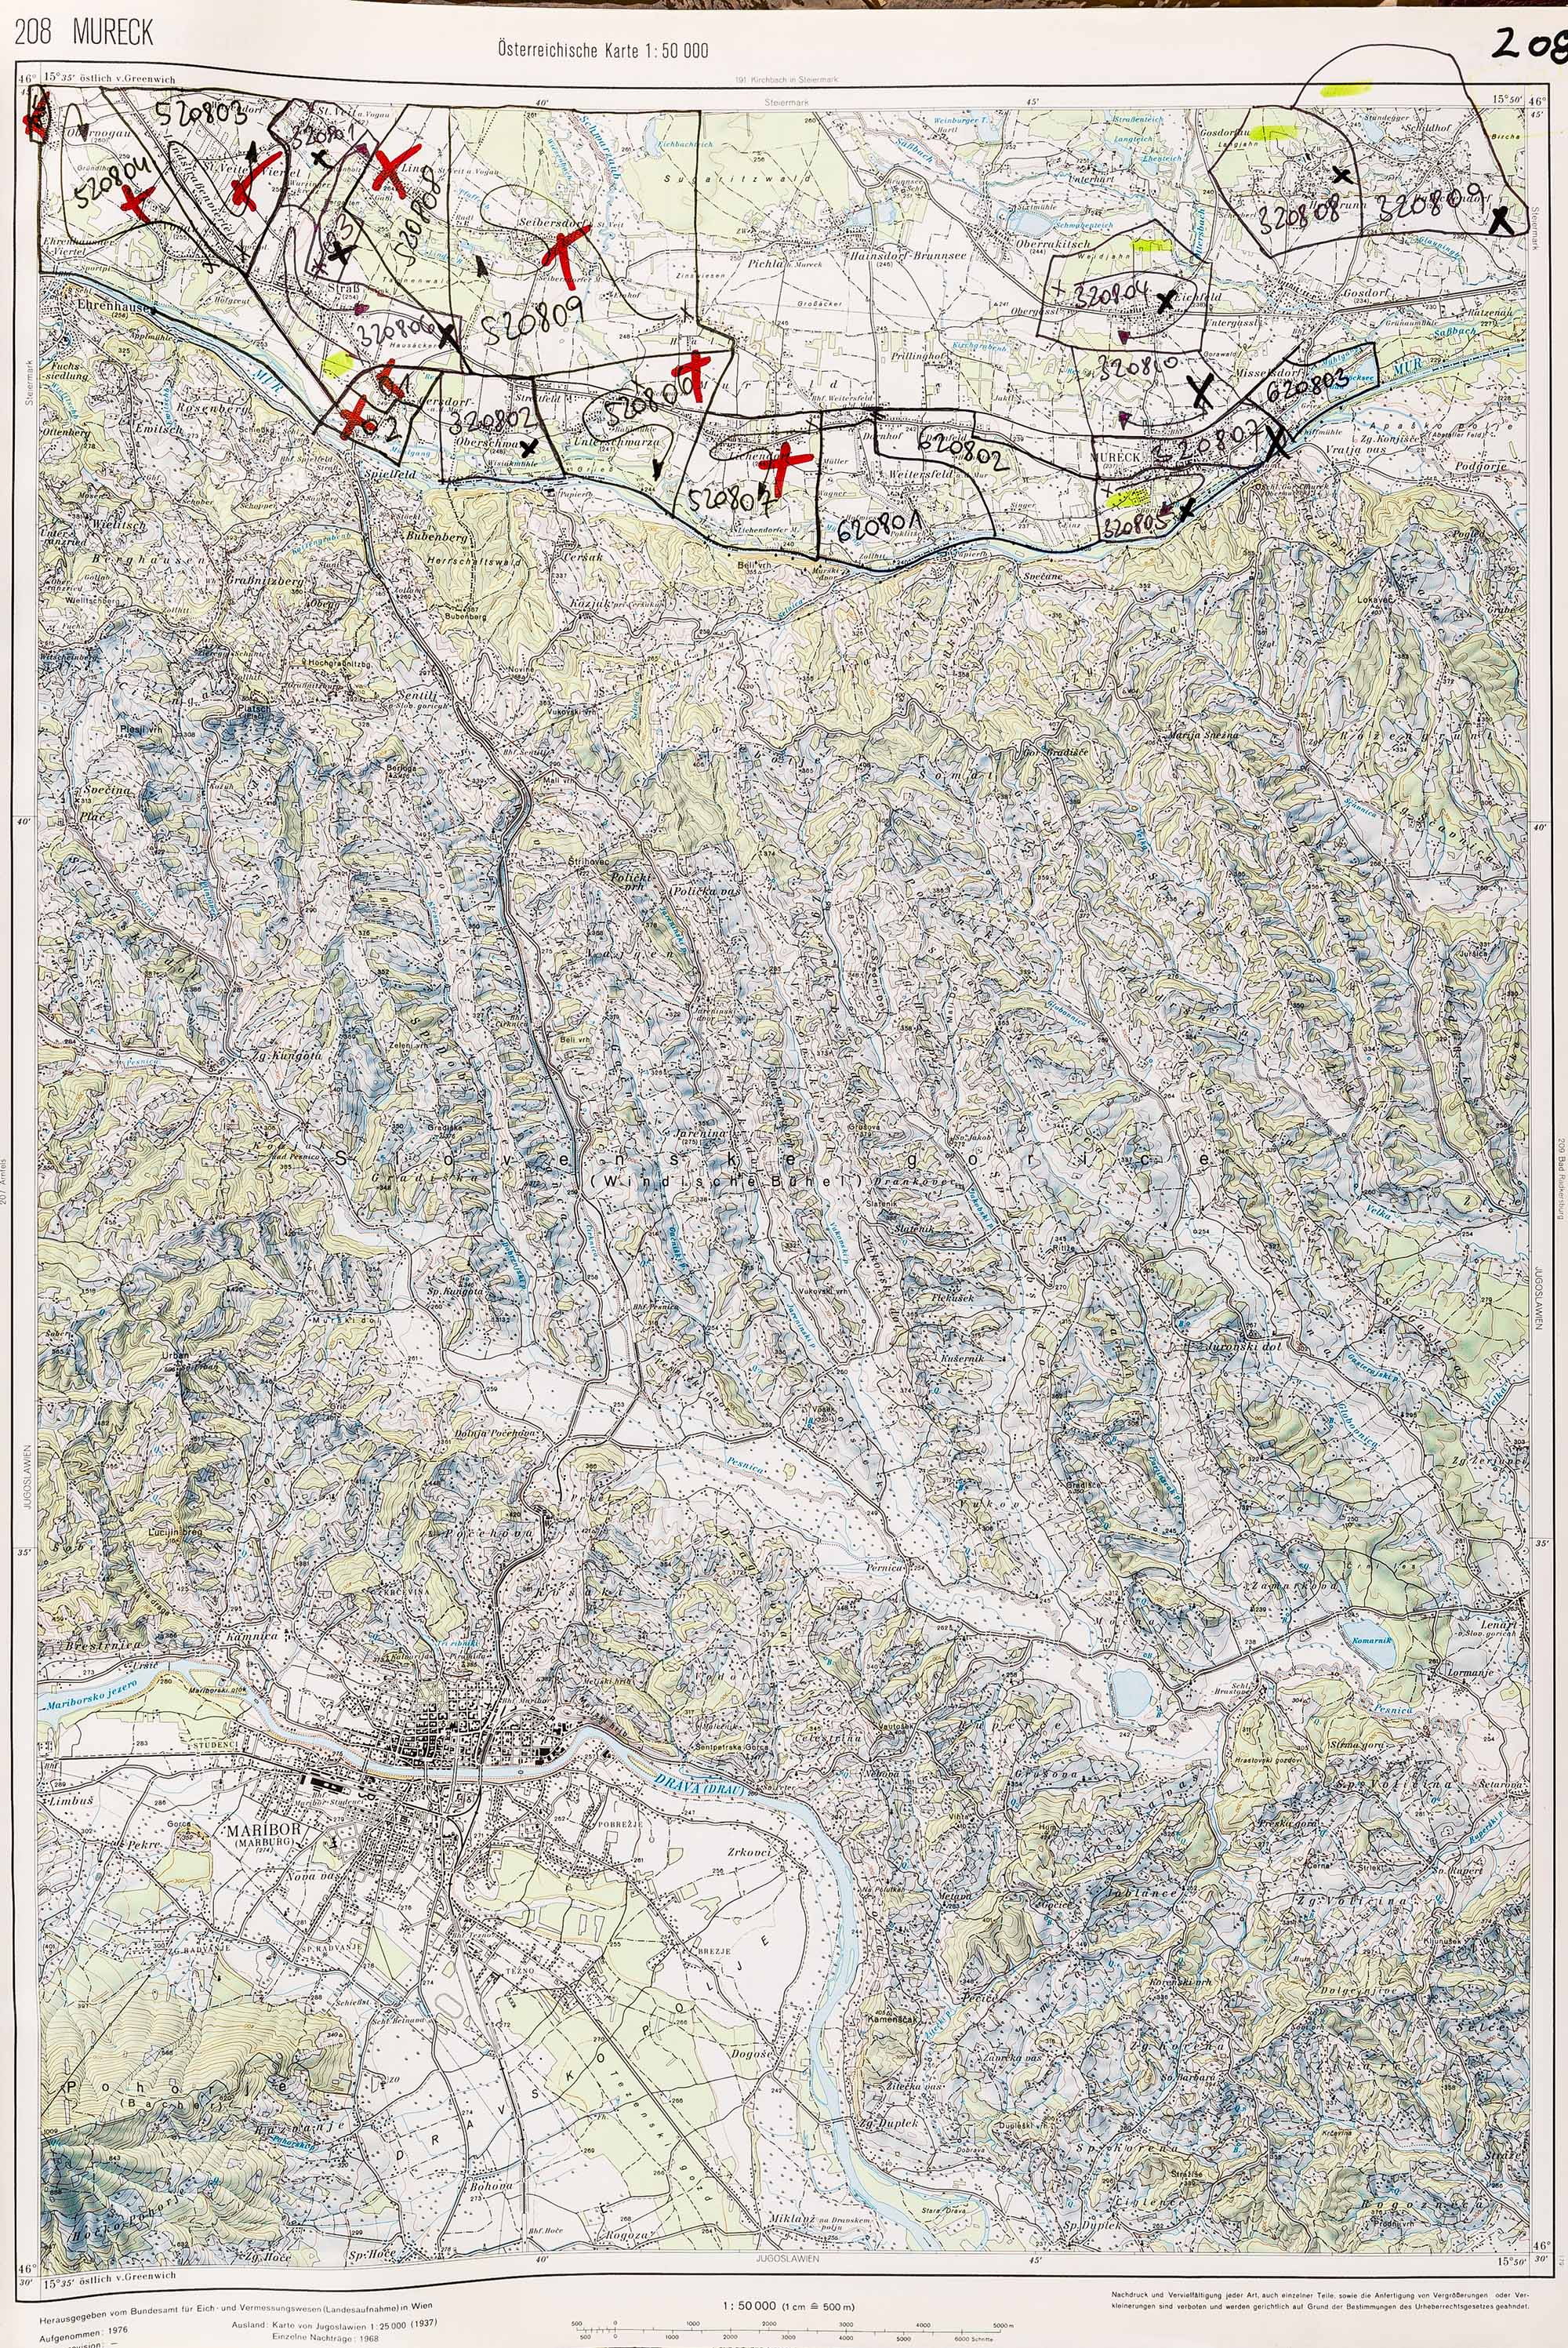 1983-1986 Karte 208